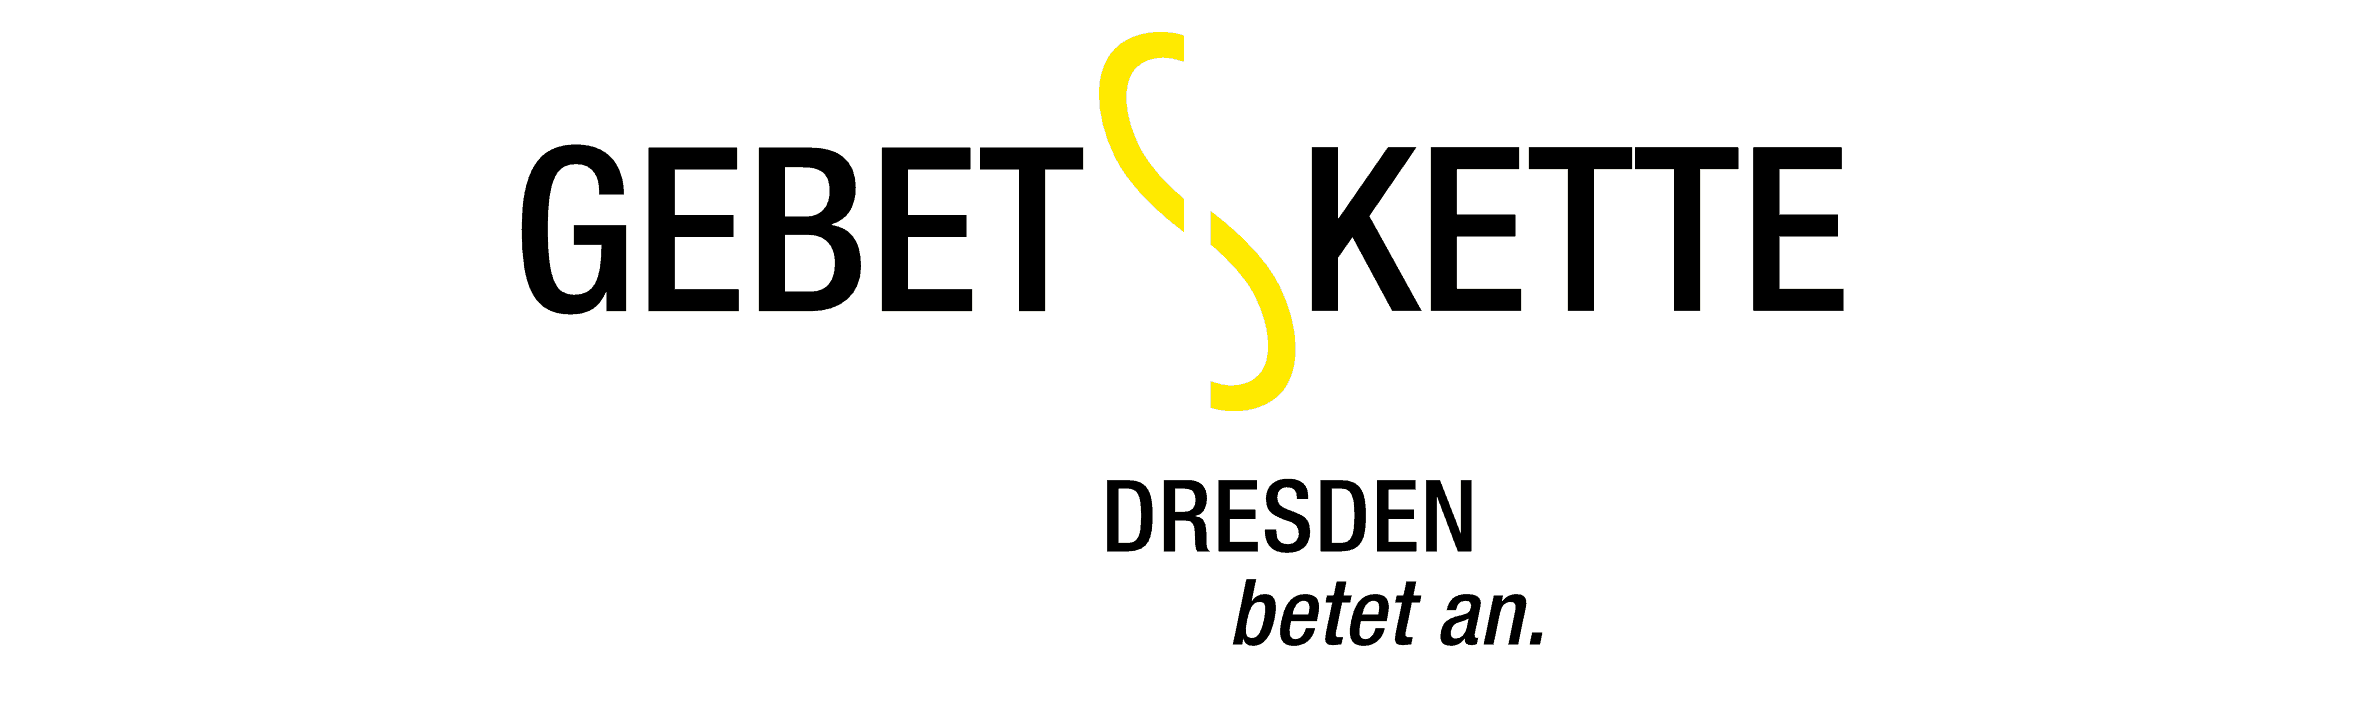 Gebetskette Dresden